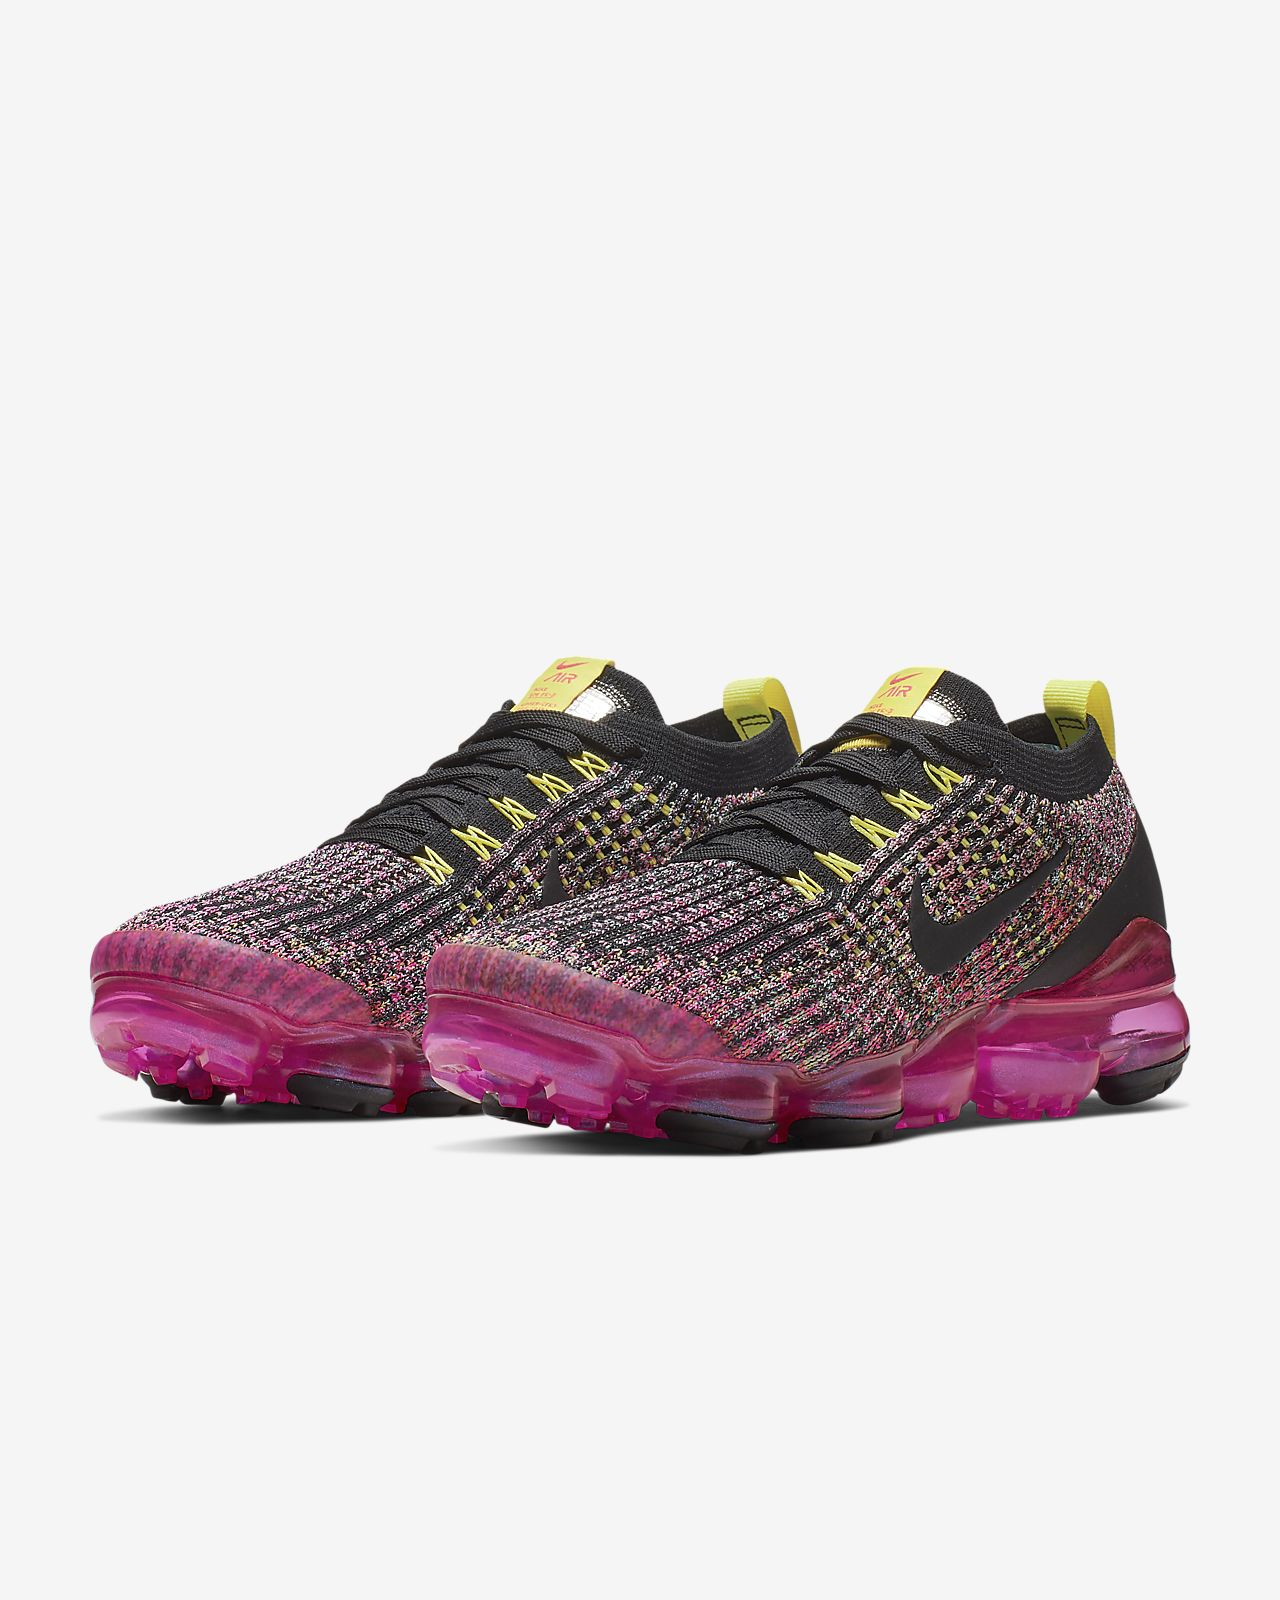 Femme Chaussure Flyknit 3 Nike Vapormax Pour Air dxoeCB